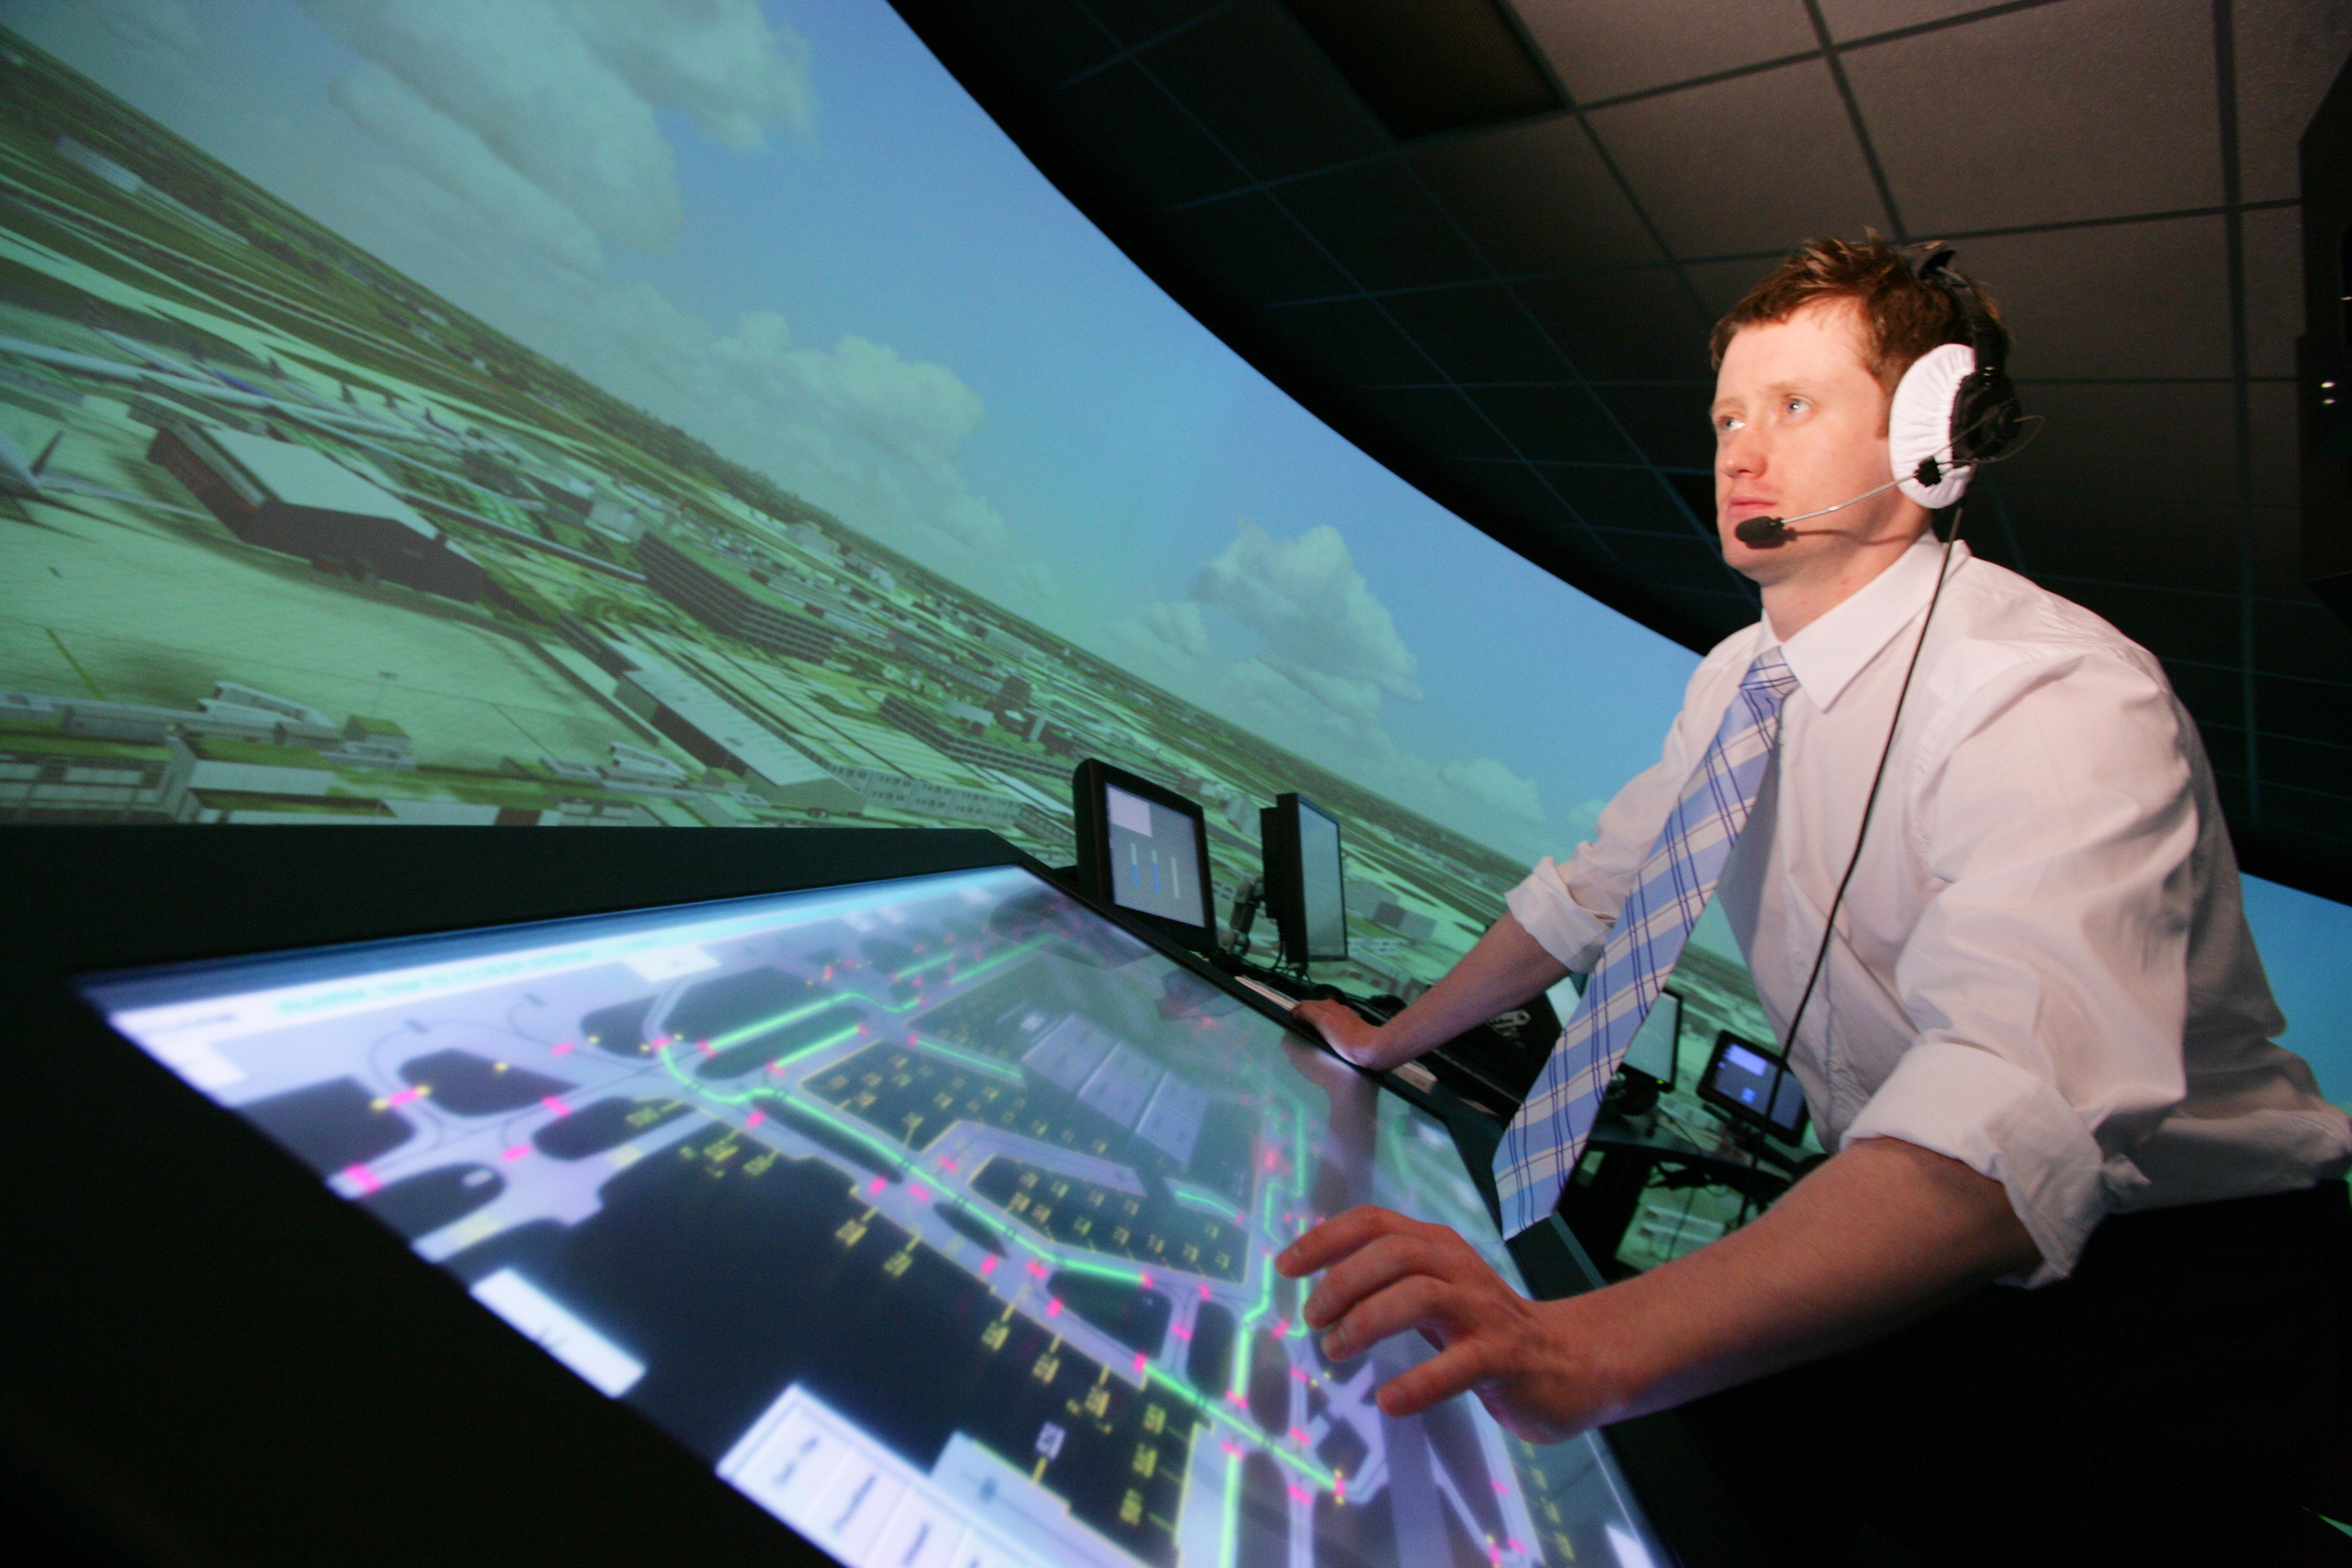 London Heathrow BEST 3D Tower 360 degree simulator